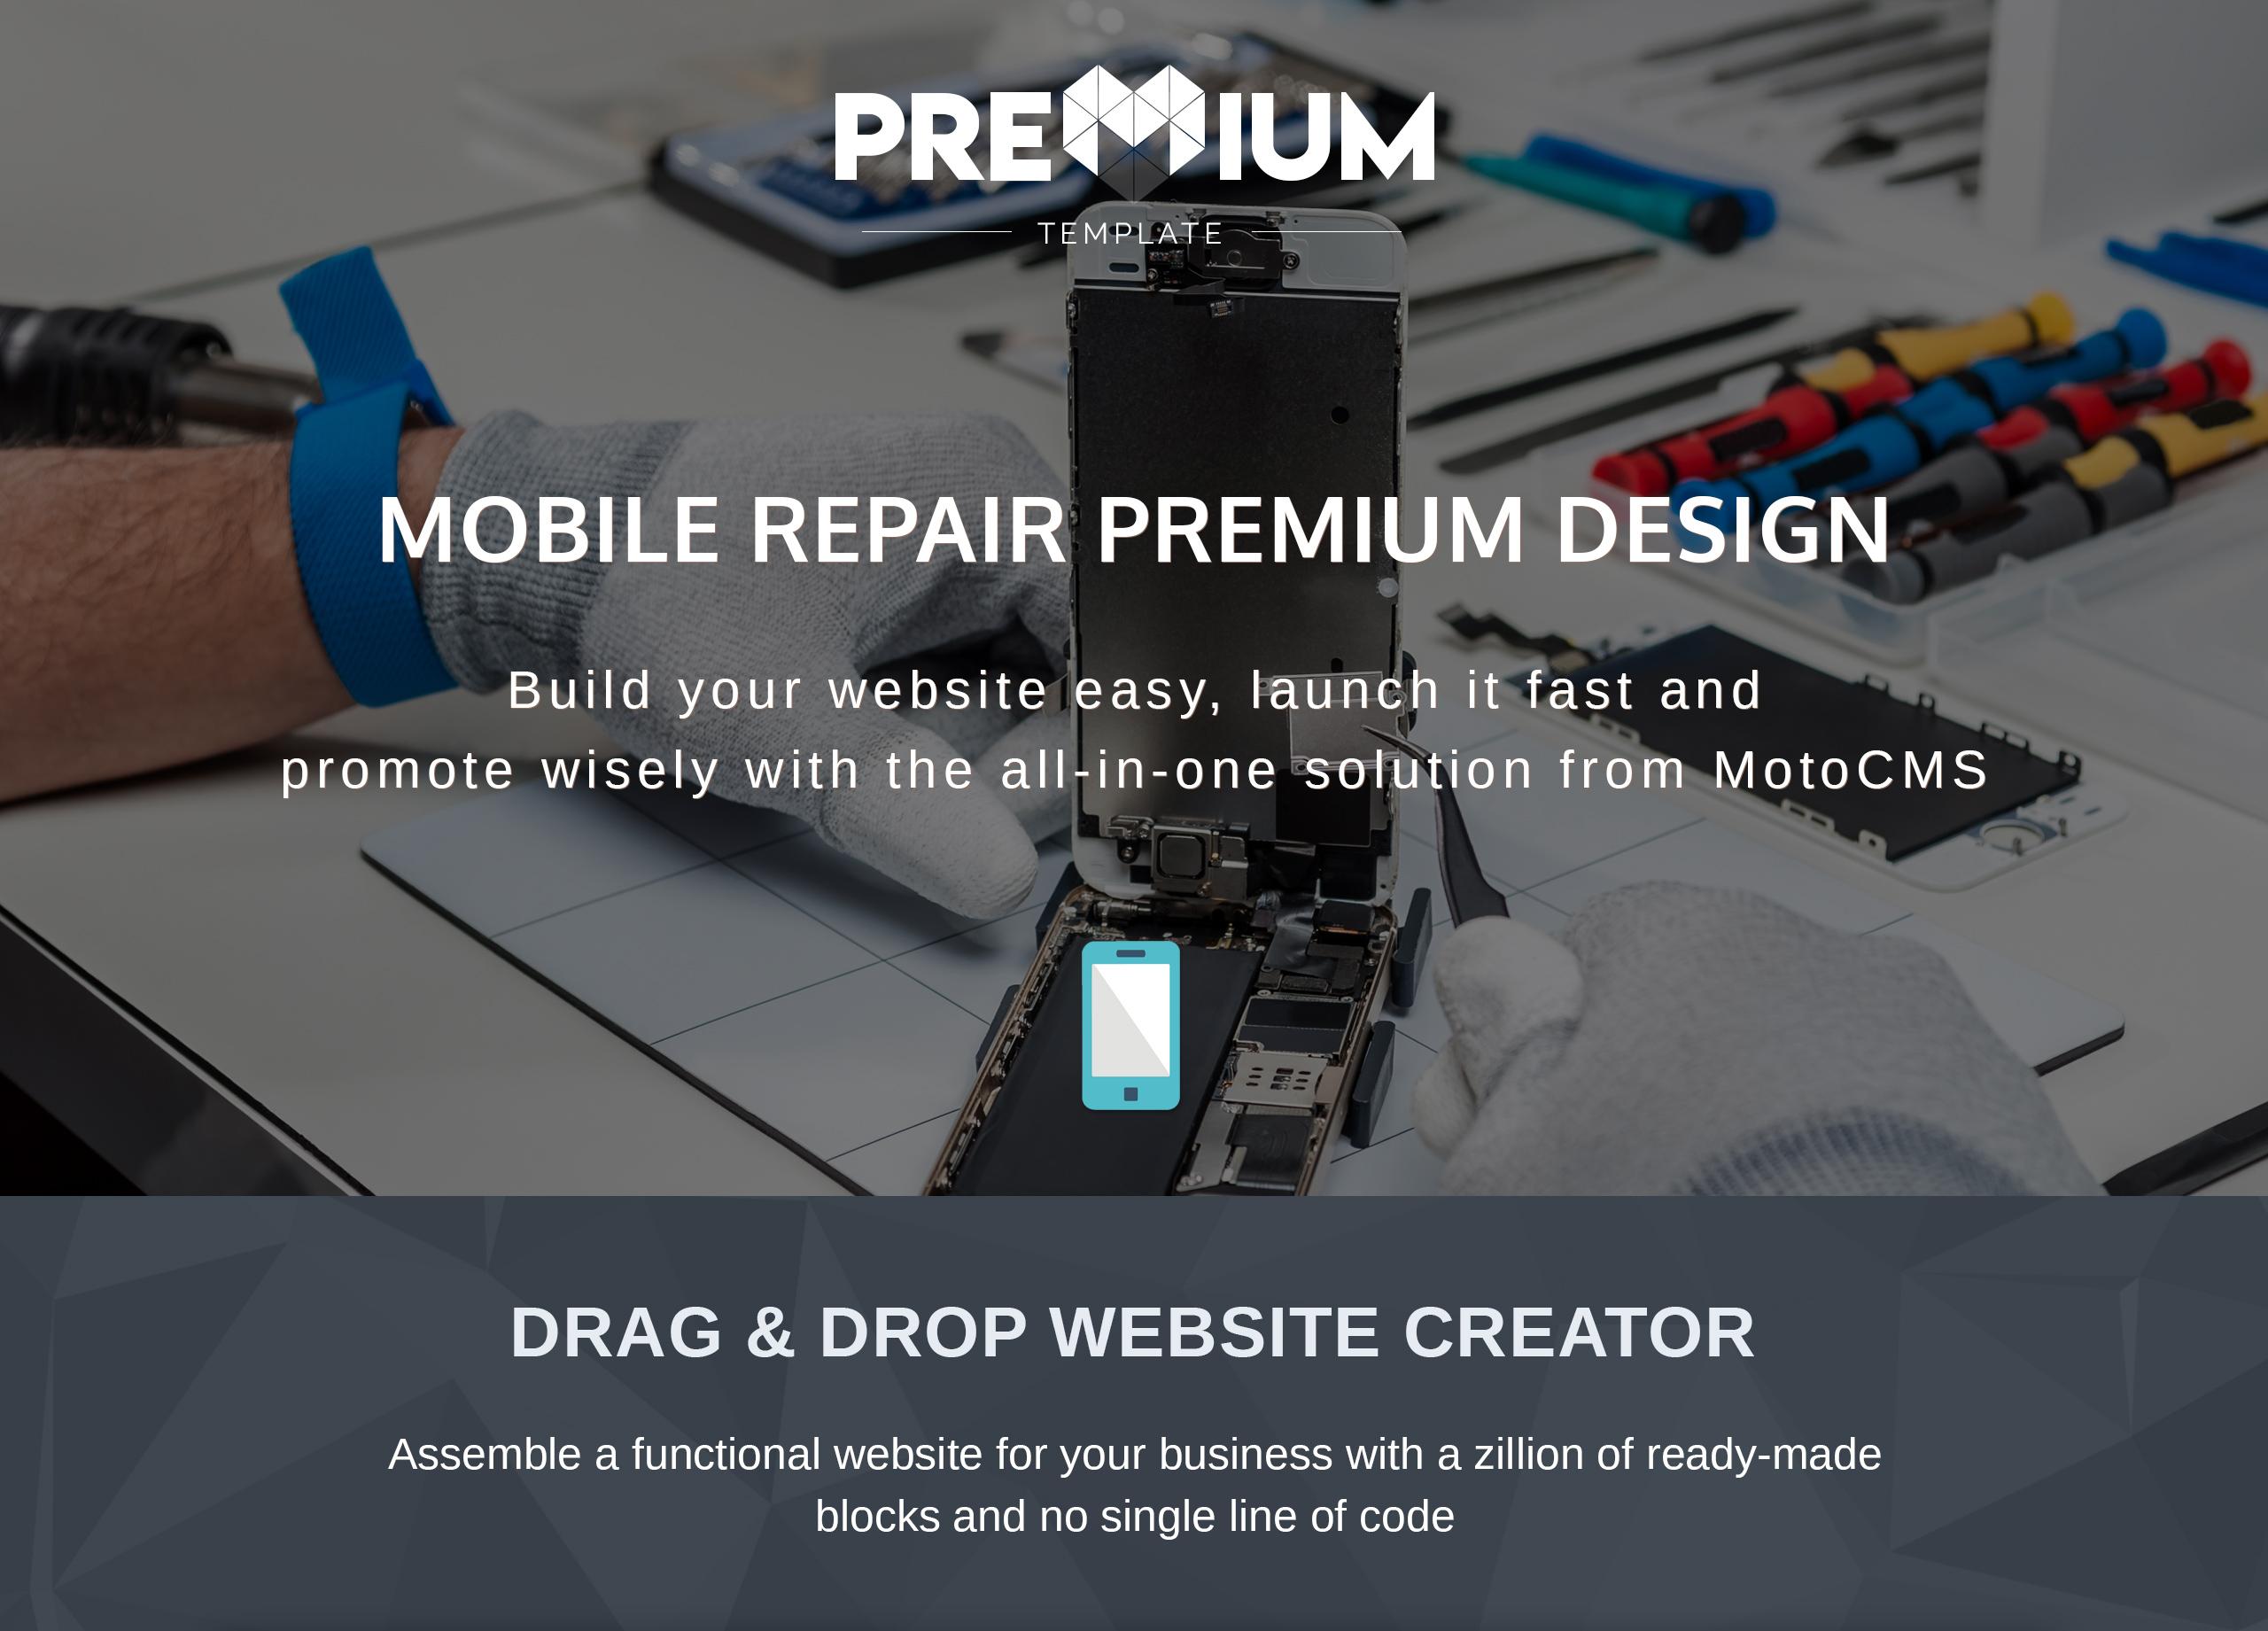 Mobilland - Mobile Repair Services Moto CMS 3 Template